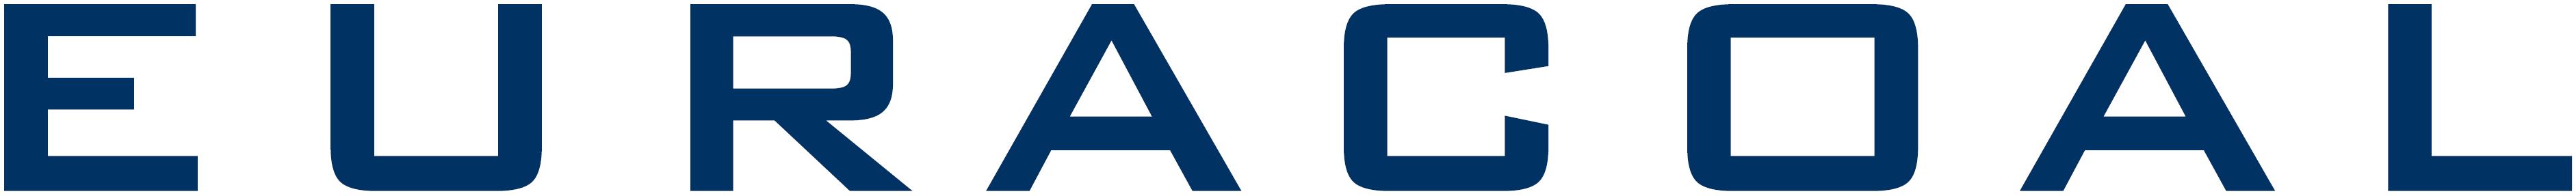 logo for European Association for Coal and Lignite